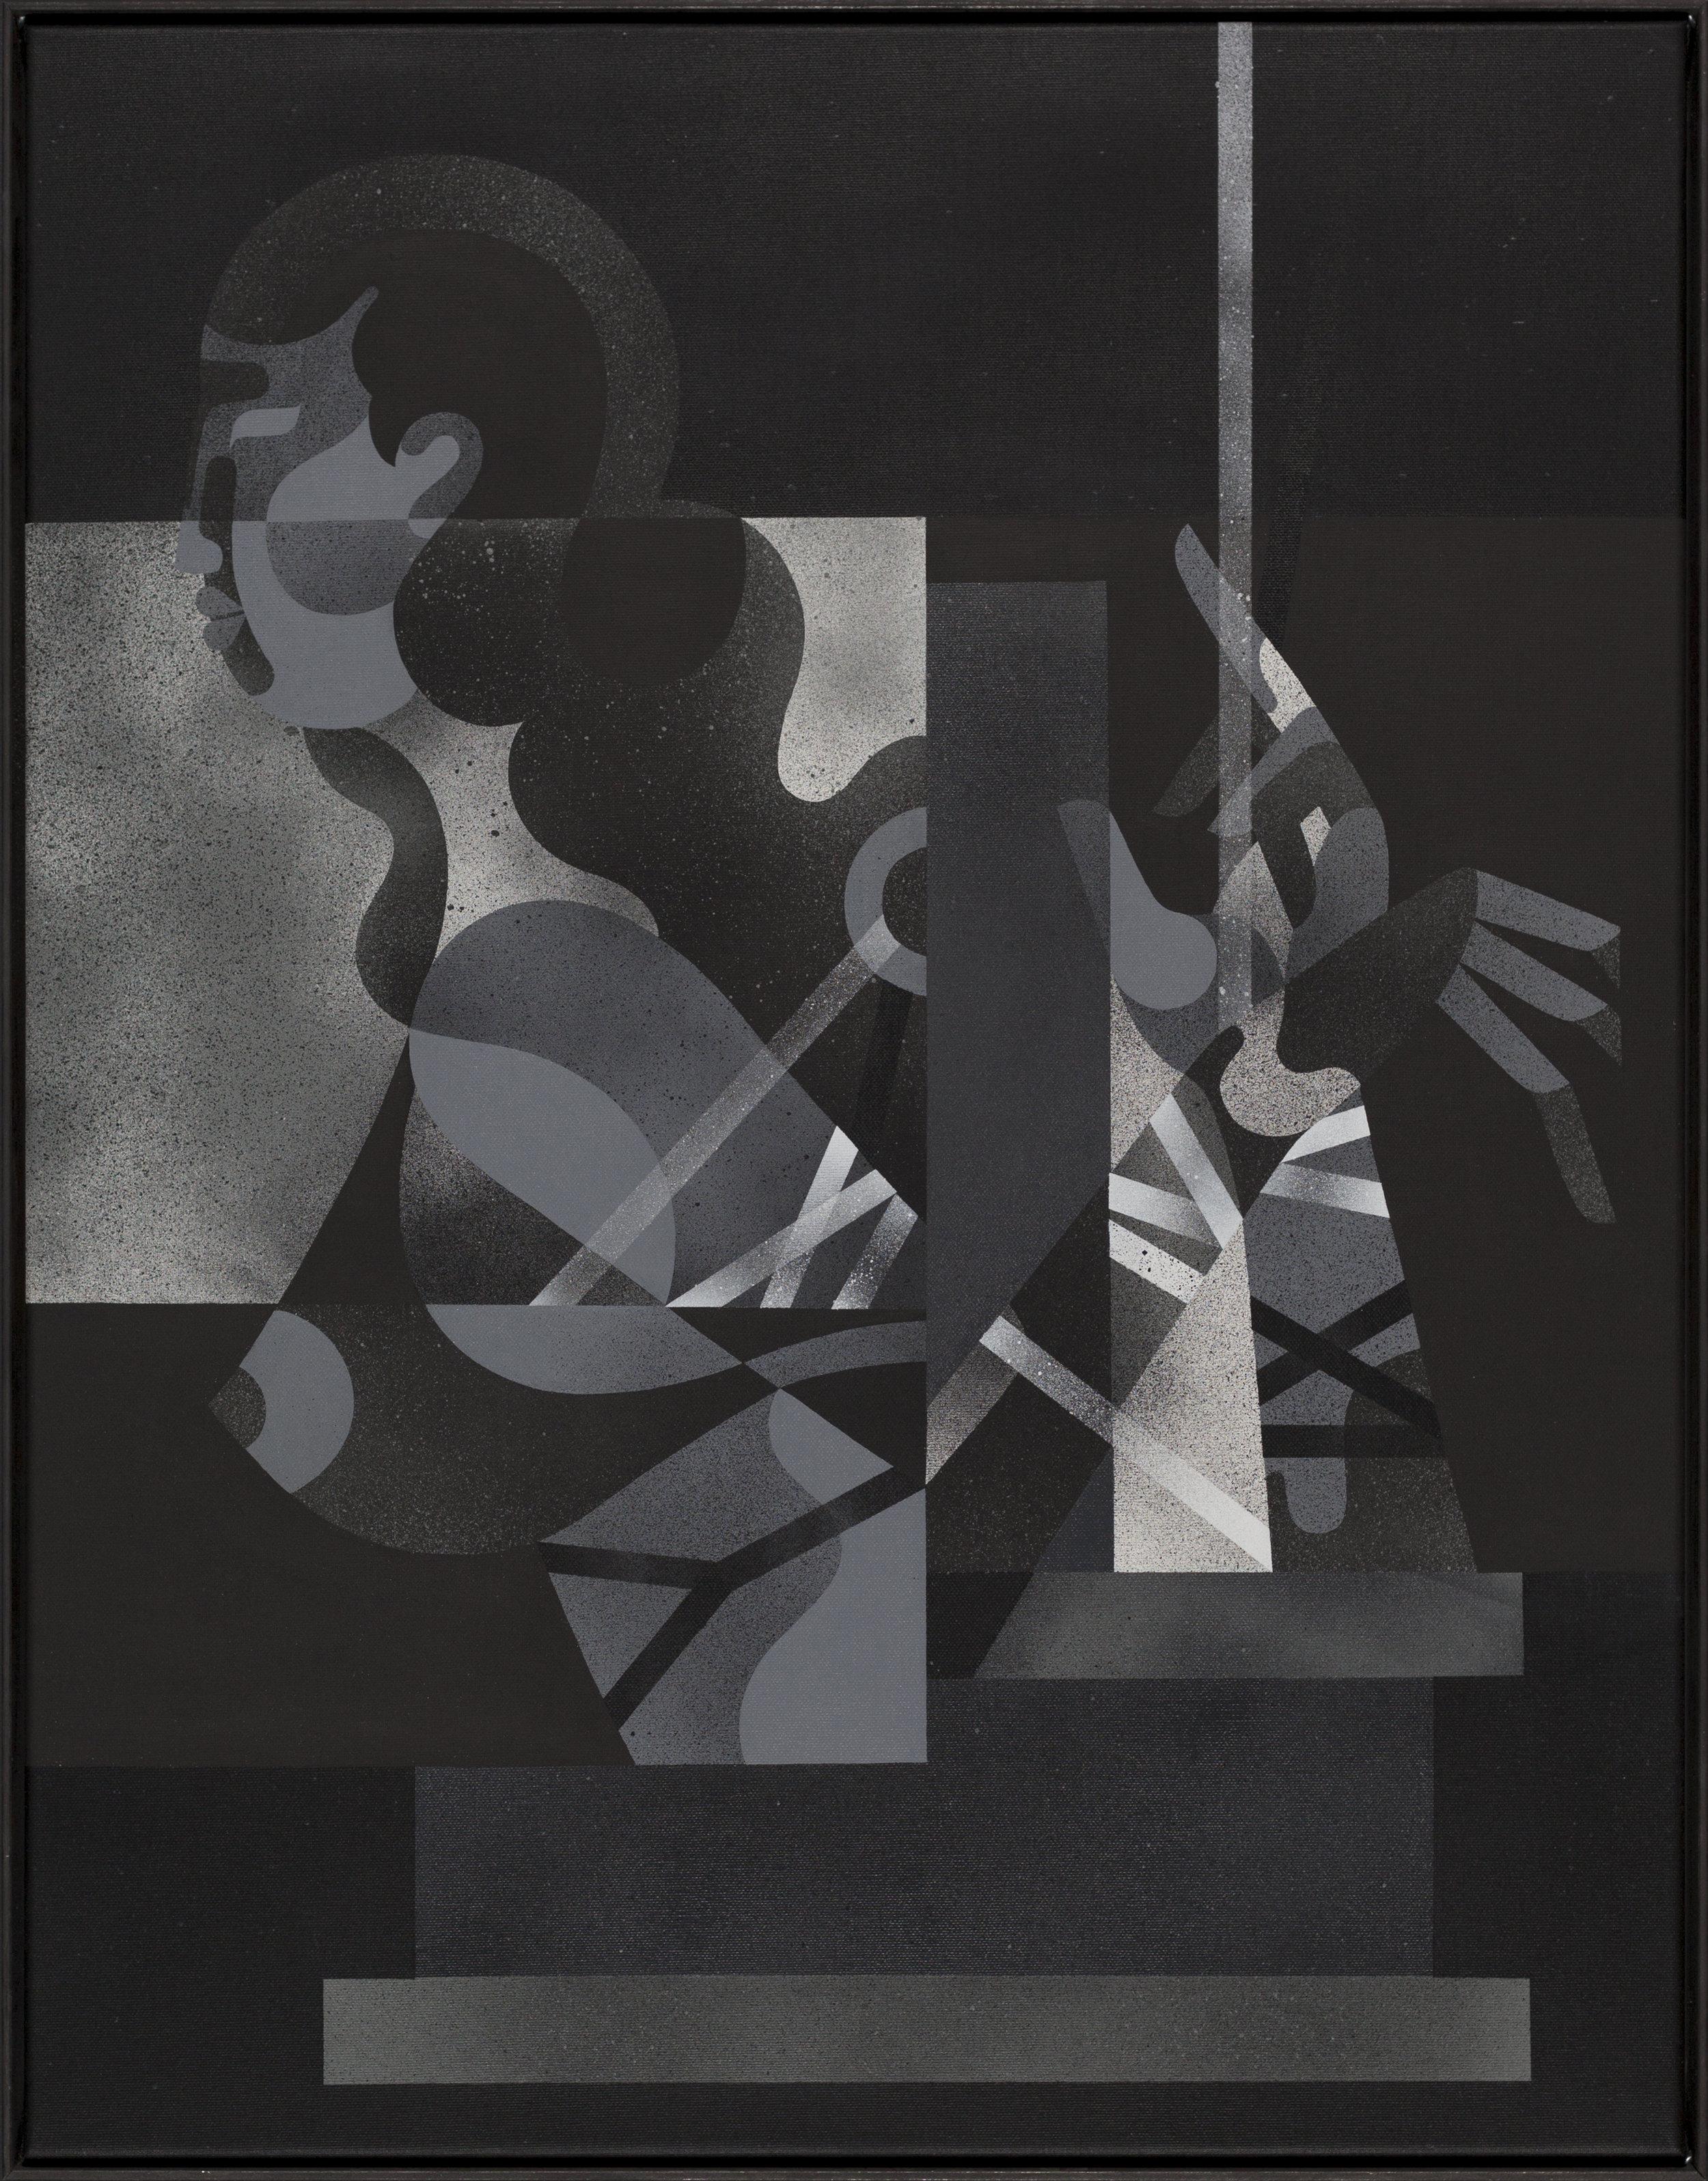 Dunkelkammer, Scarlet by James Reka